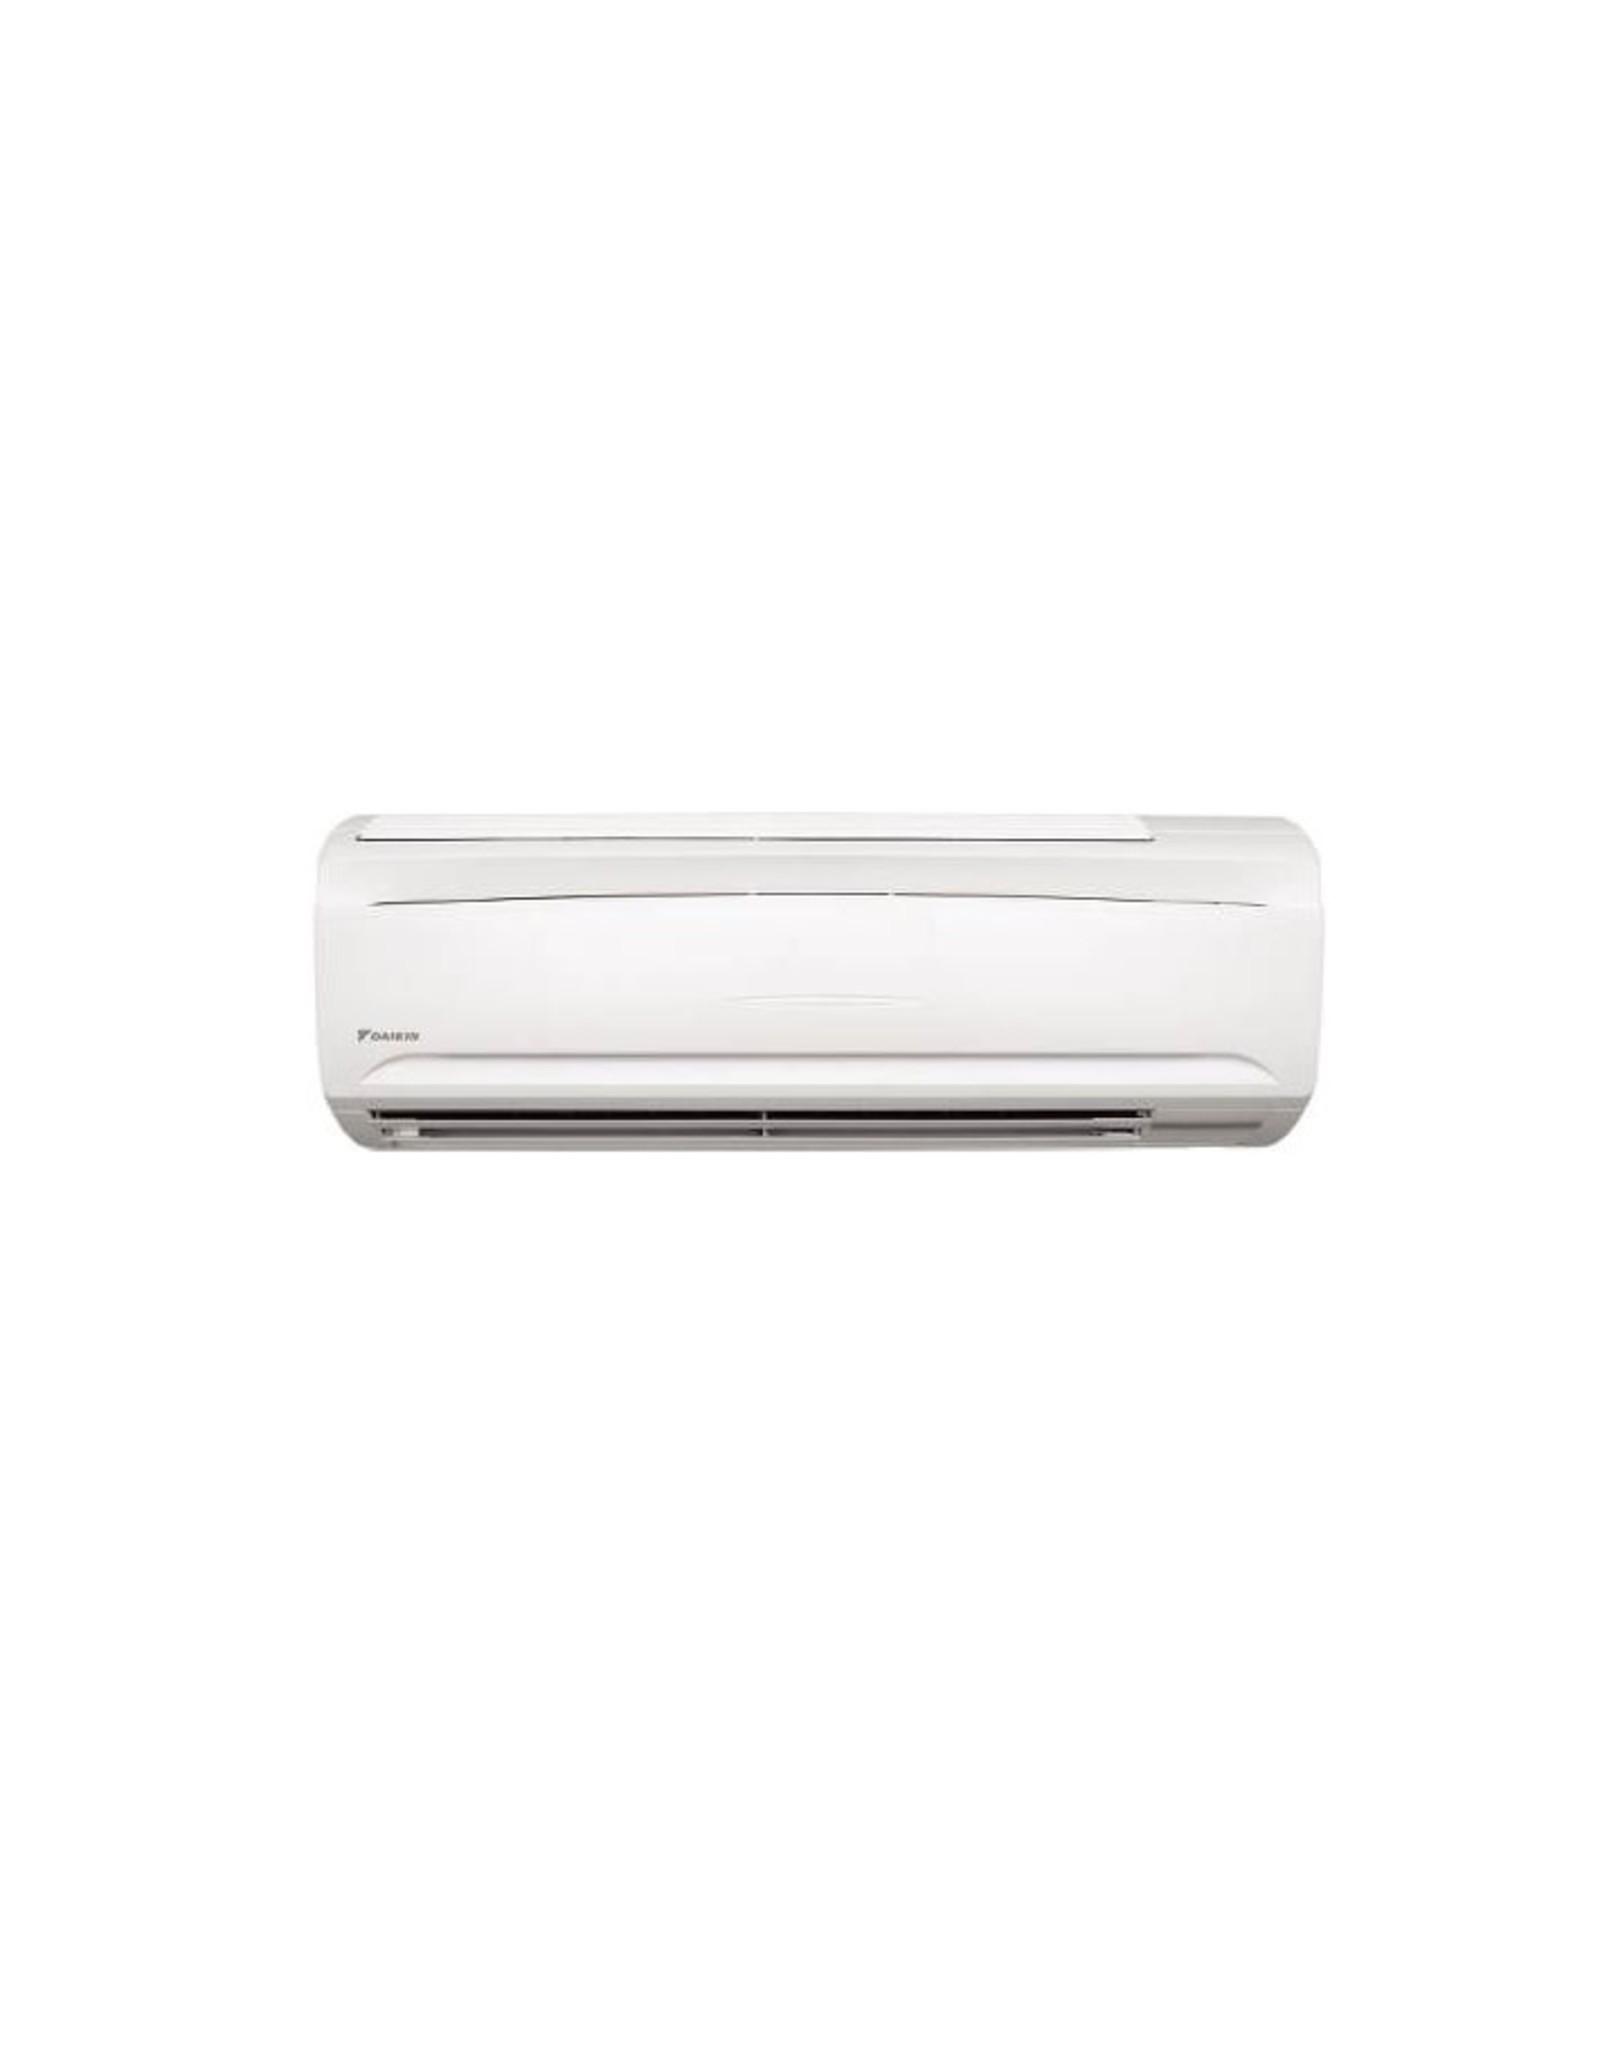 Daikin Applied Americas SkyAir FAQ Cooling/HeatPump Single Zone Wall Mount System AHU - 208/230 - 1ph